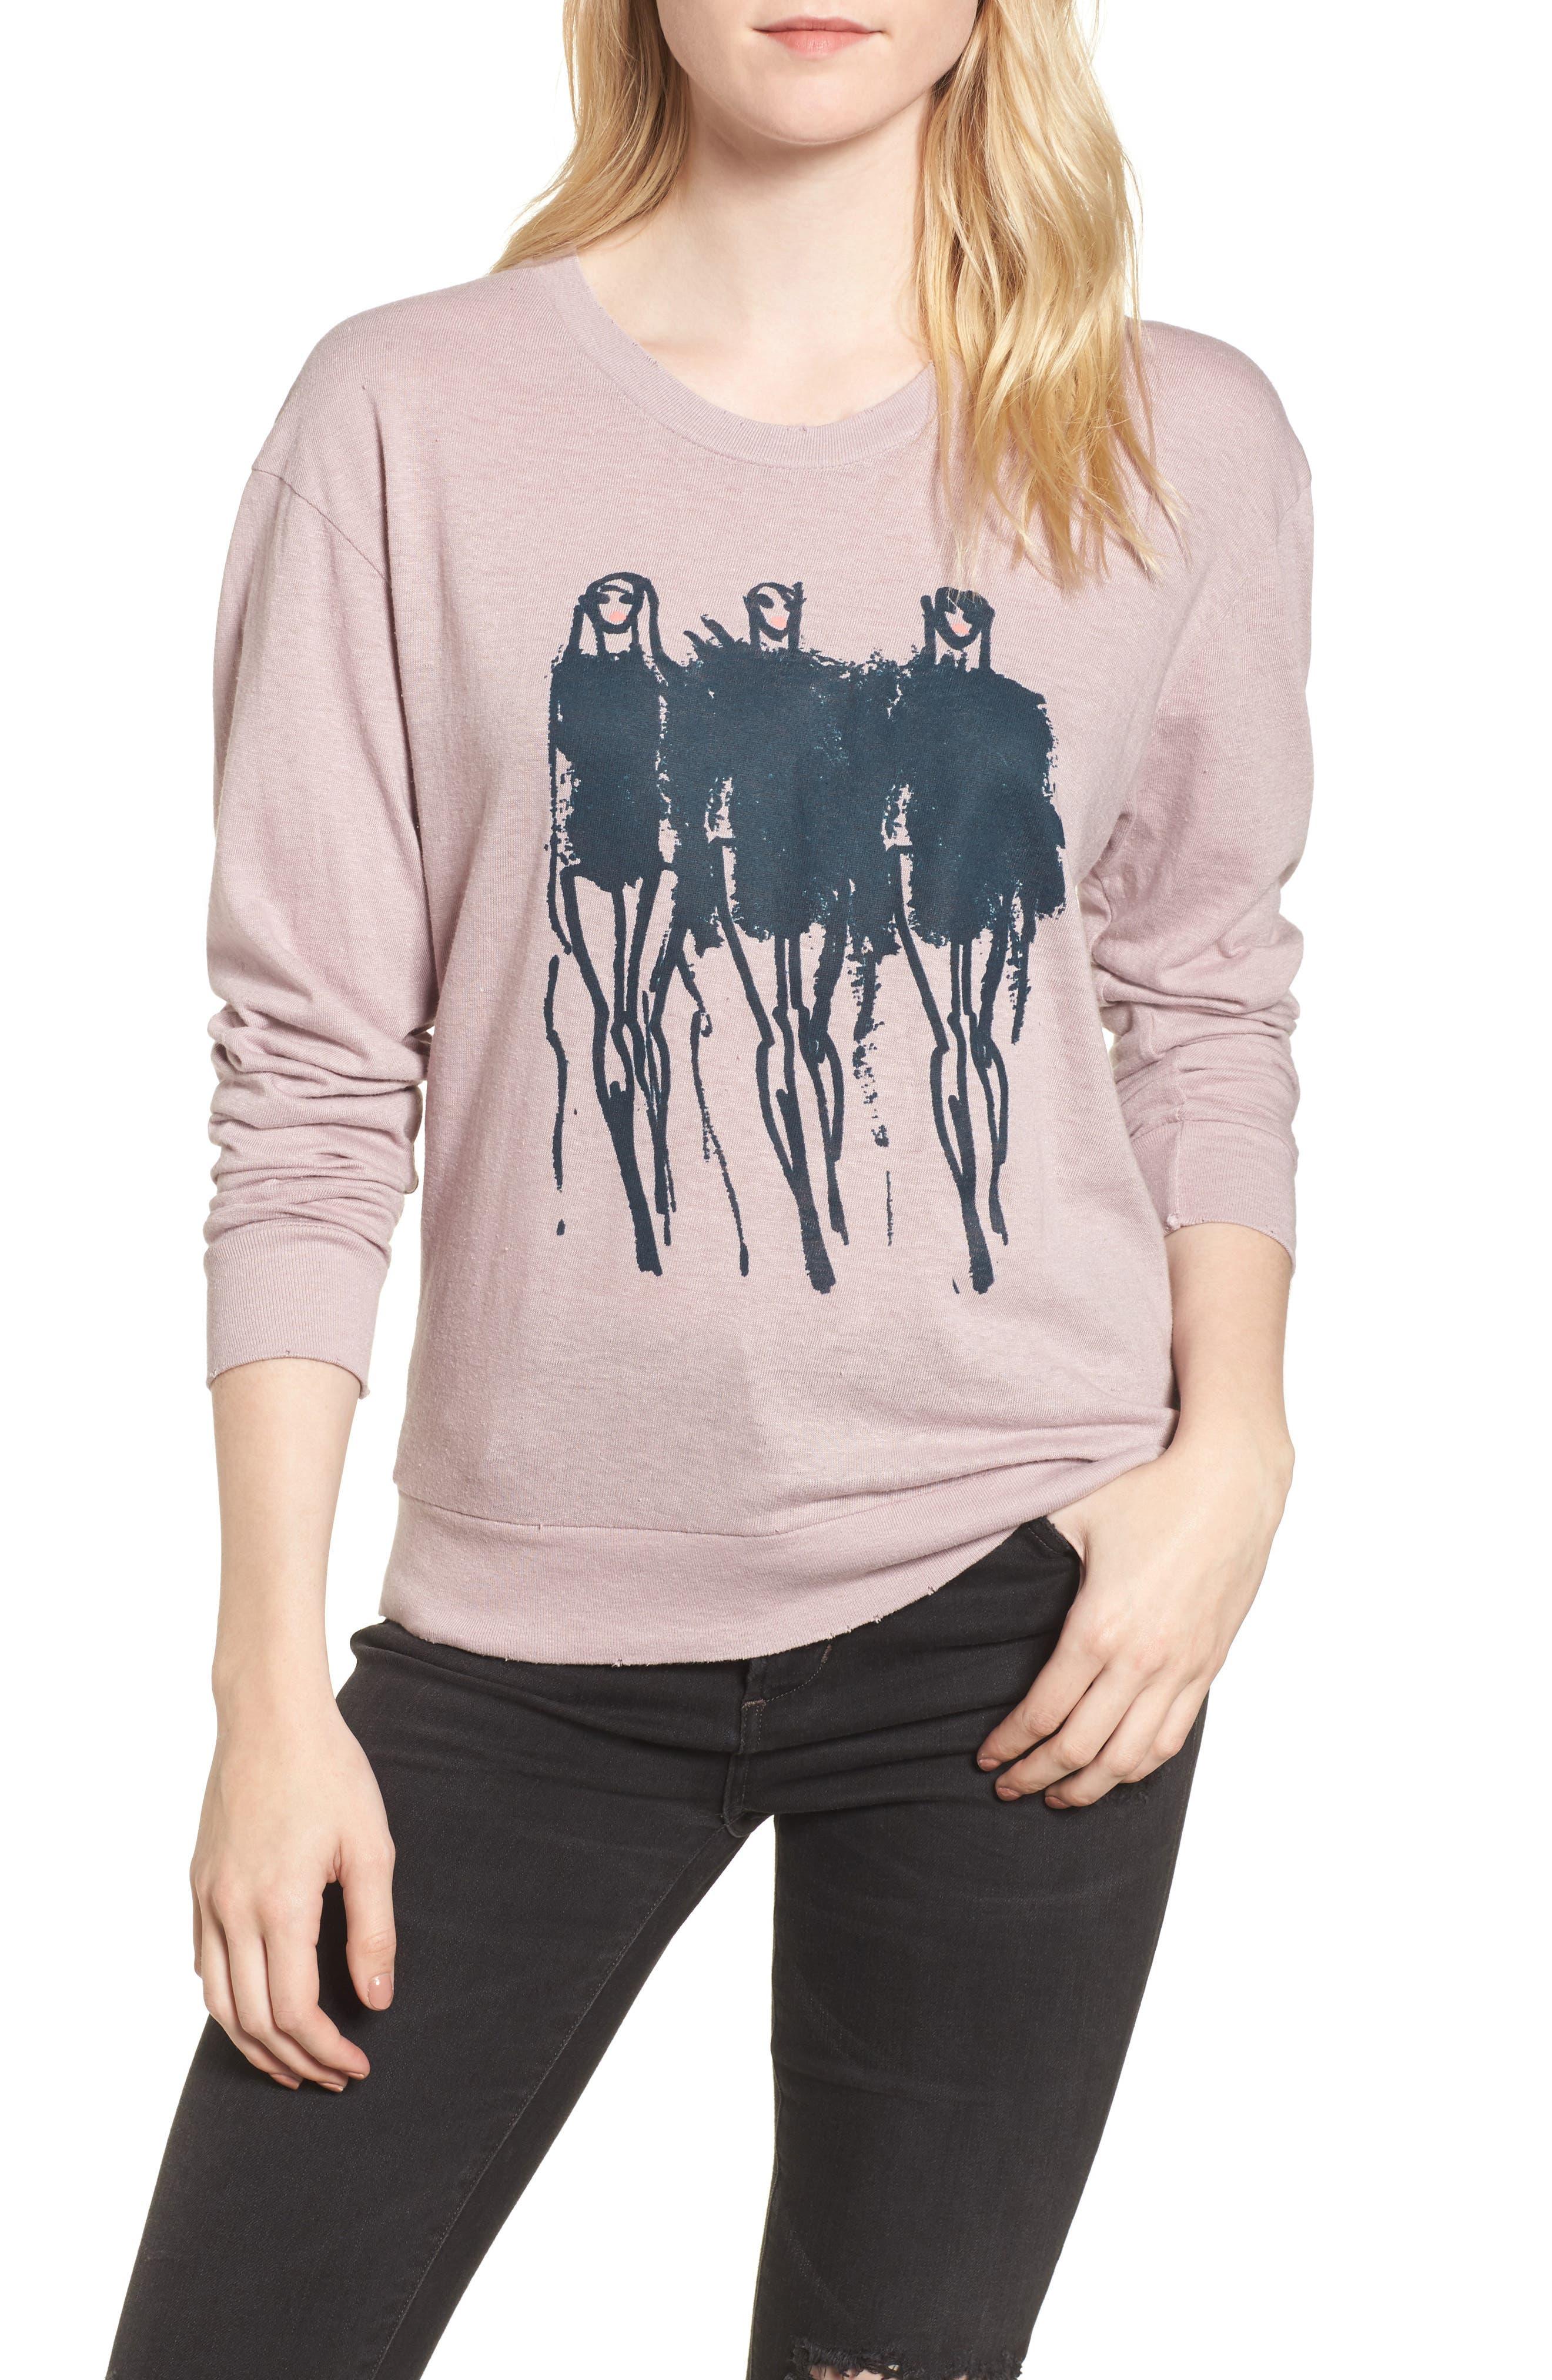 x Donald Robertson Black Dresses Sweatshirt,                             Main thumbnail 1, color,                             670